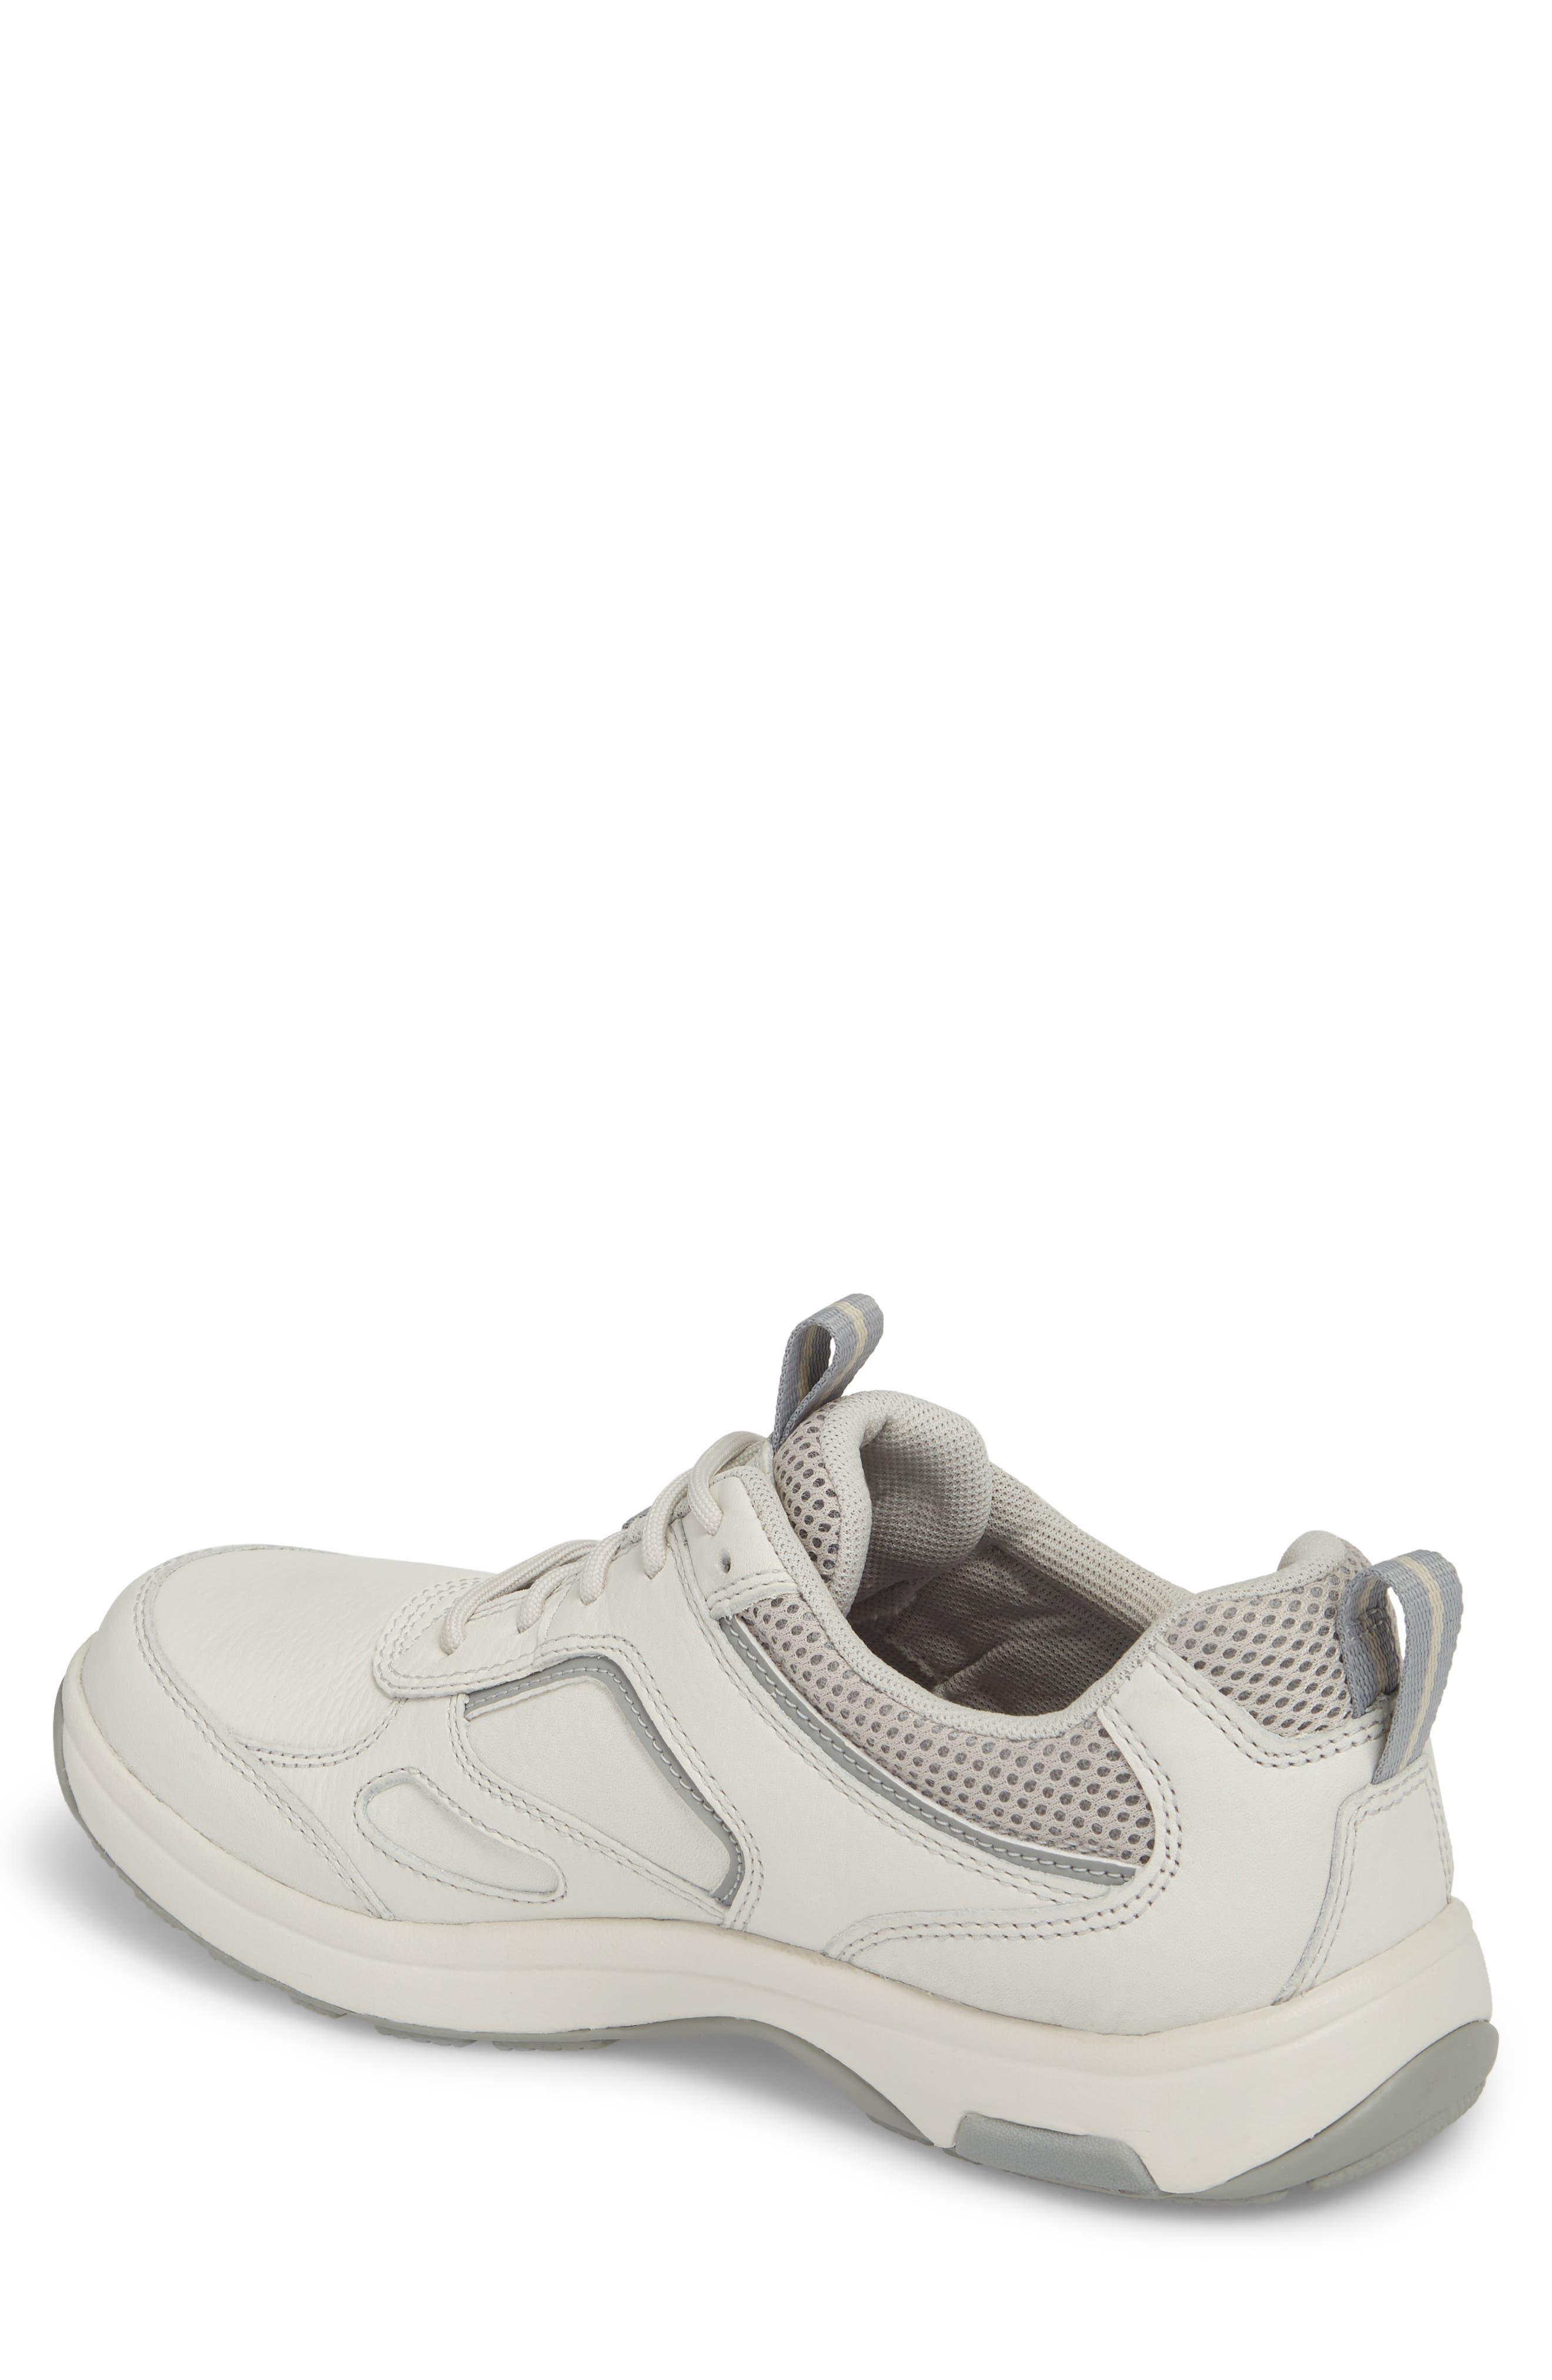 8000 Uball Sneaker,                             Alternate thumbnail 2, color,                             Off White Leather